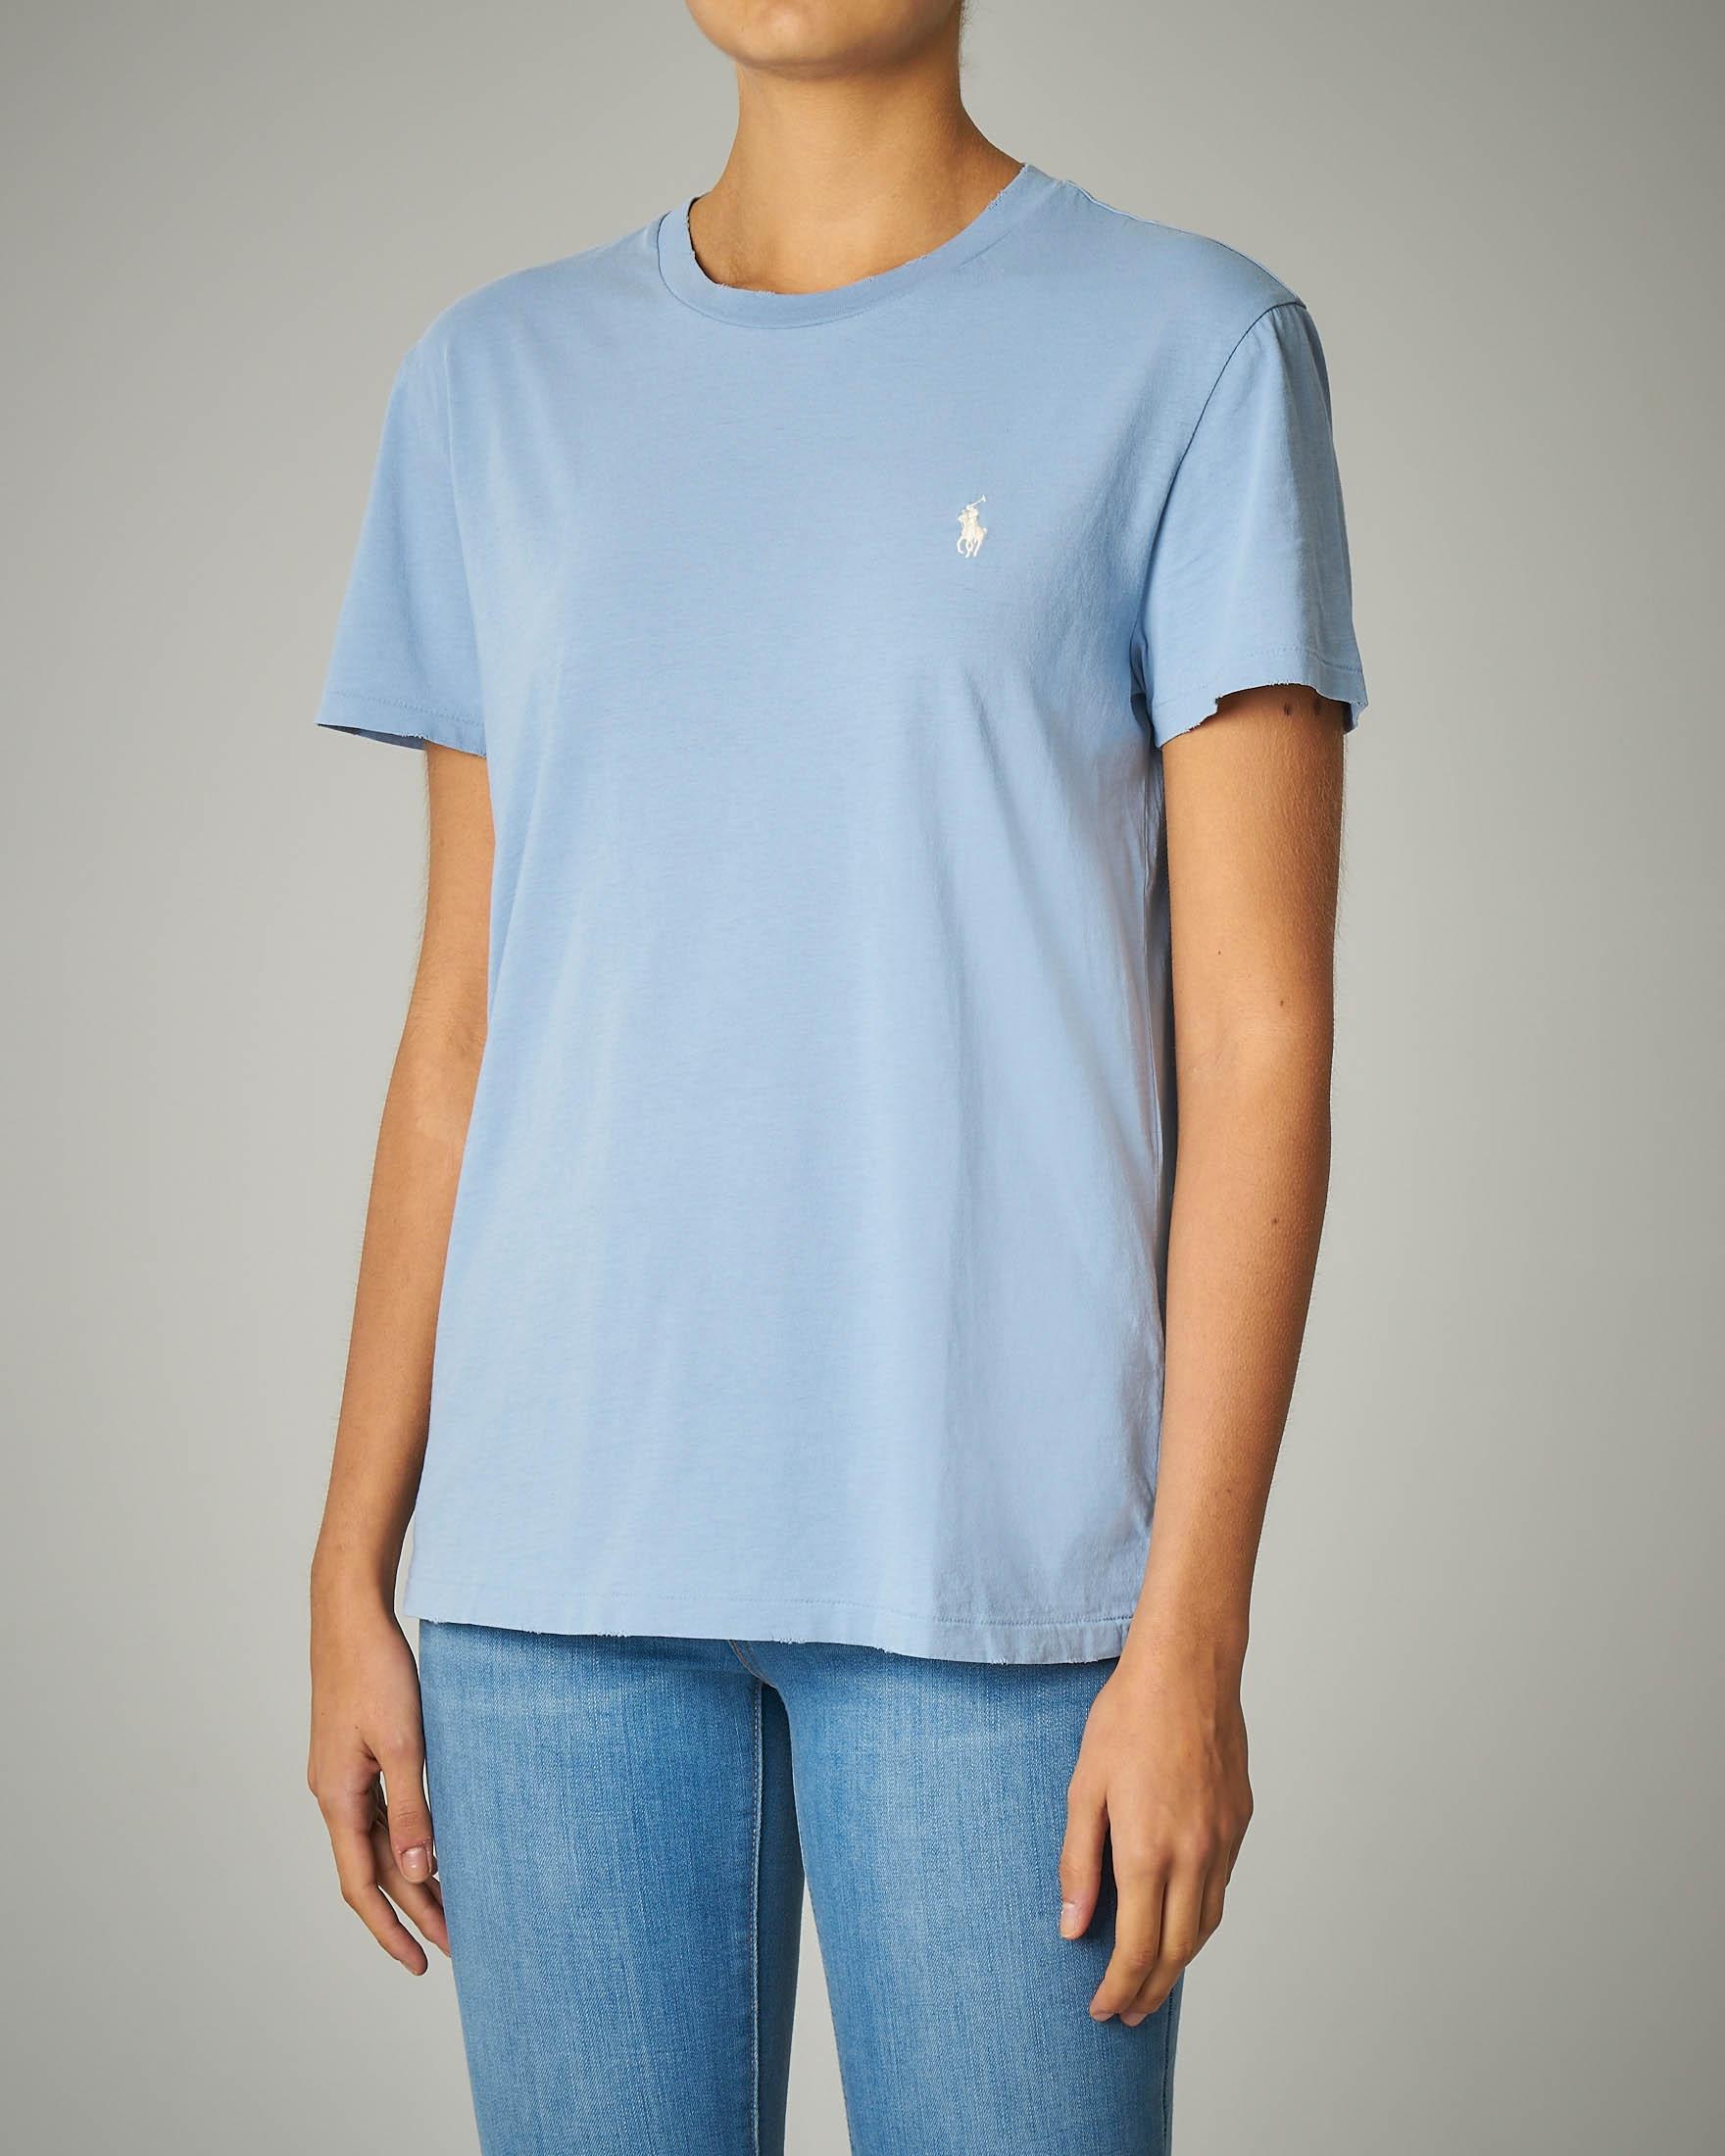 T-shirt girocollo in cotone azzurra